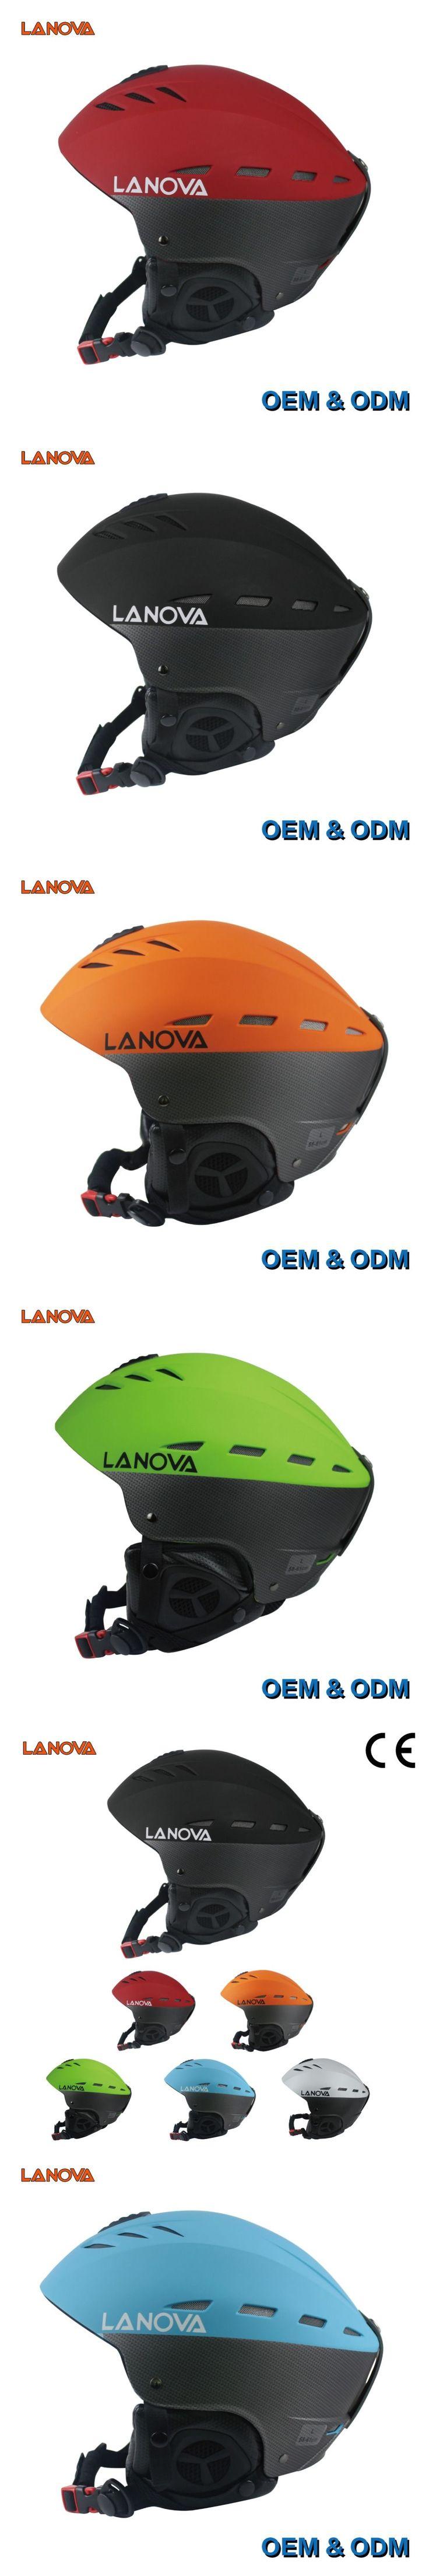 LANOVA Brand Professional Adult Ski Helmet Man Woman Skating/Skateboard Helmet Multicolor Snow Sports Helmets W-205 With 2 Size #skateboardingwomen